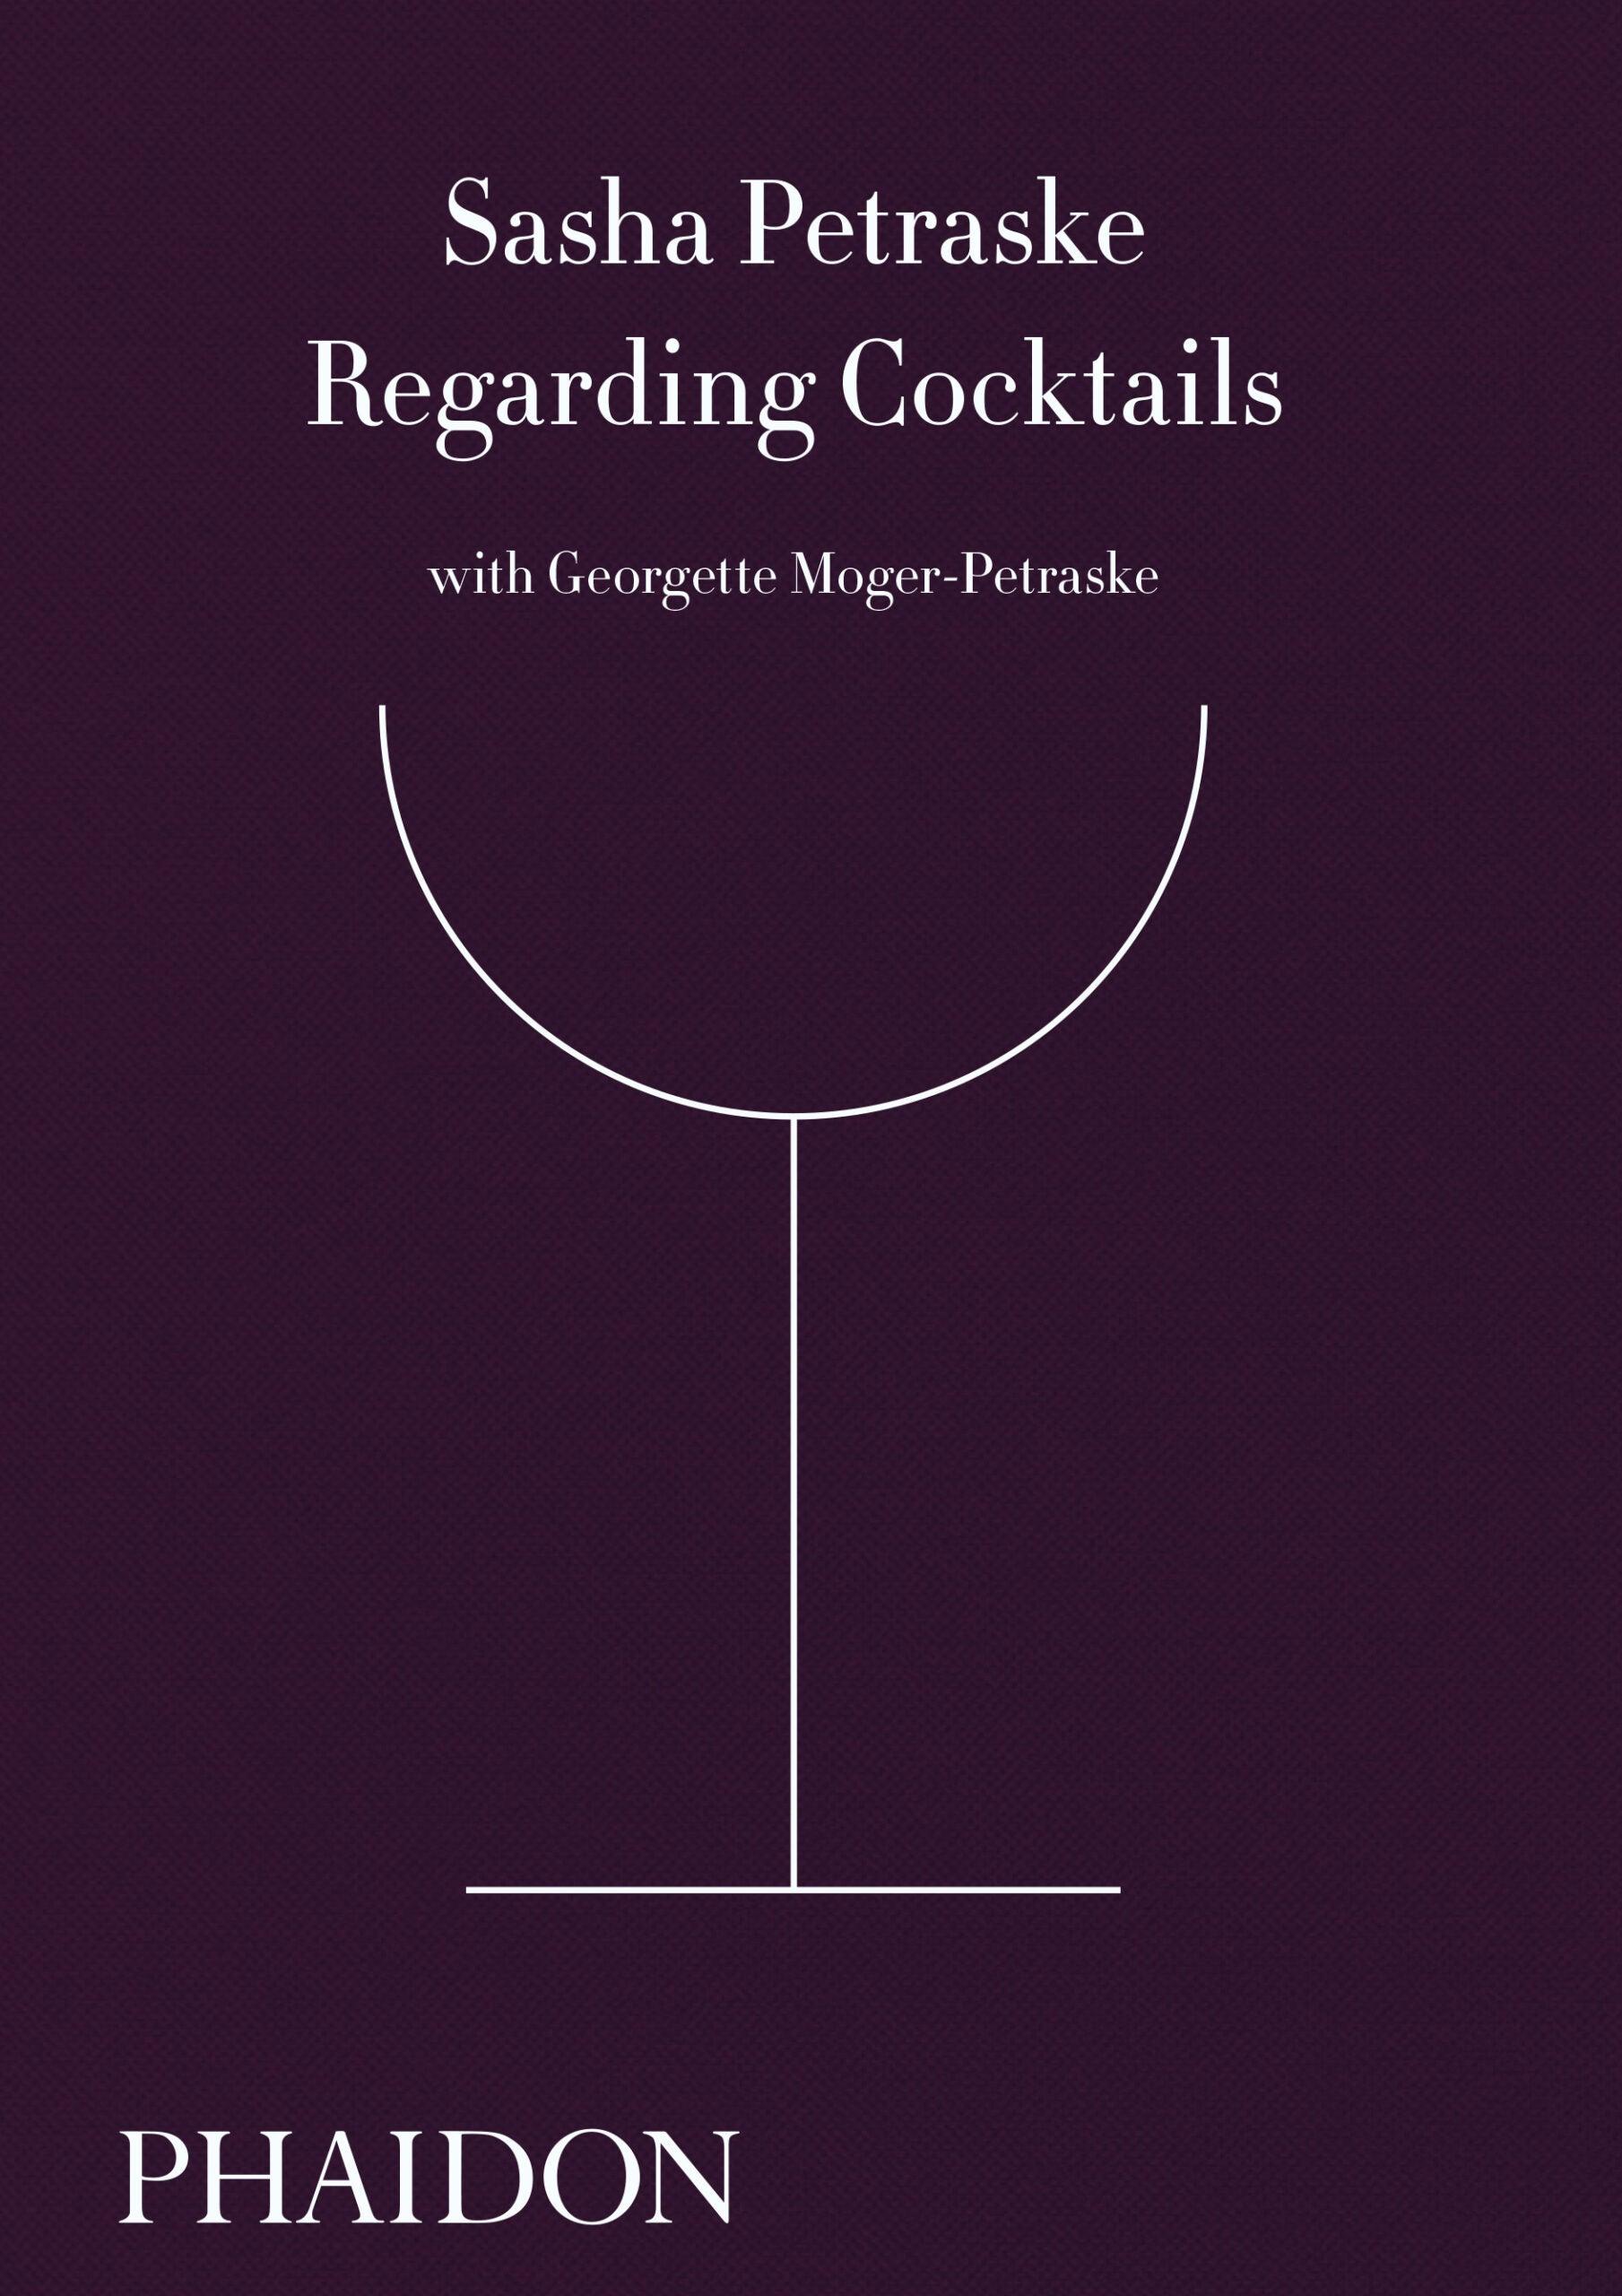 Regarding Cocktails by Sasha Petraske with Georgette Moger-Petraske, Phaidon 2016